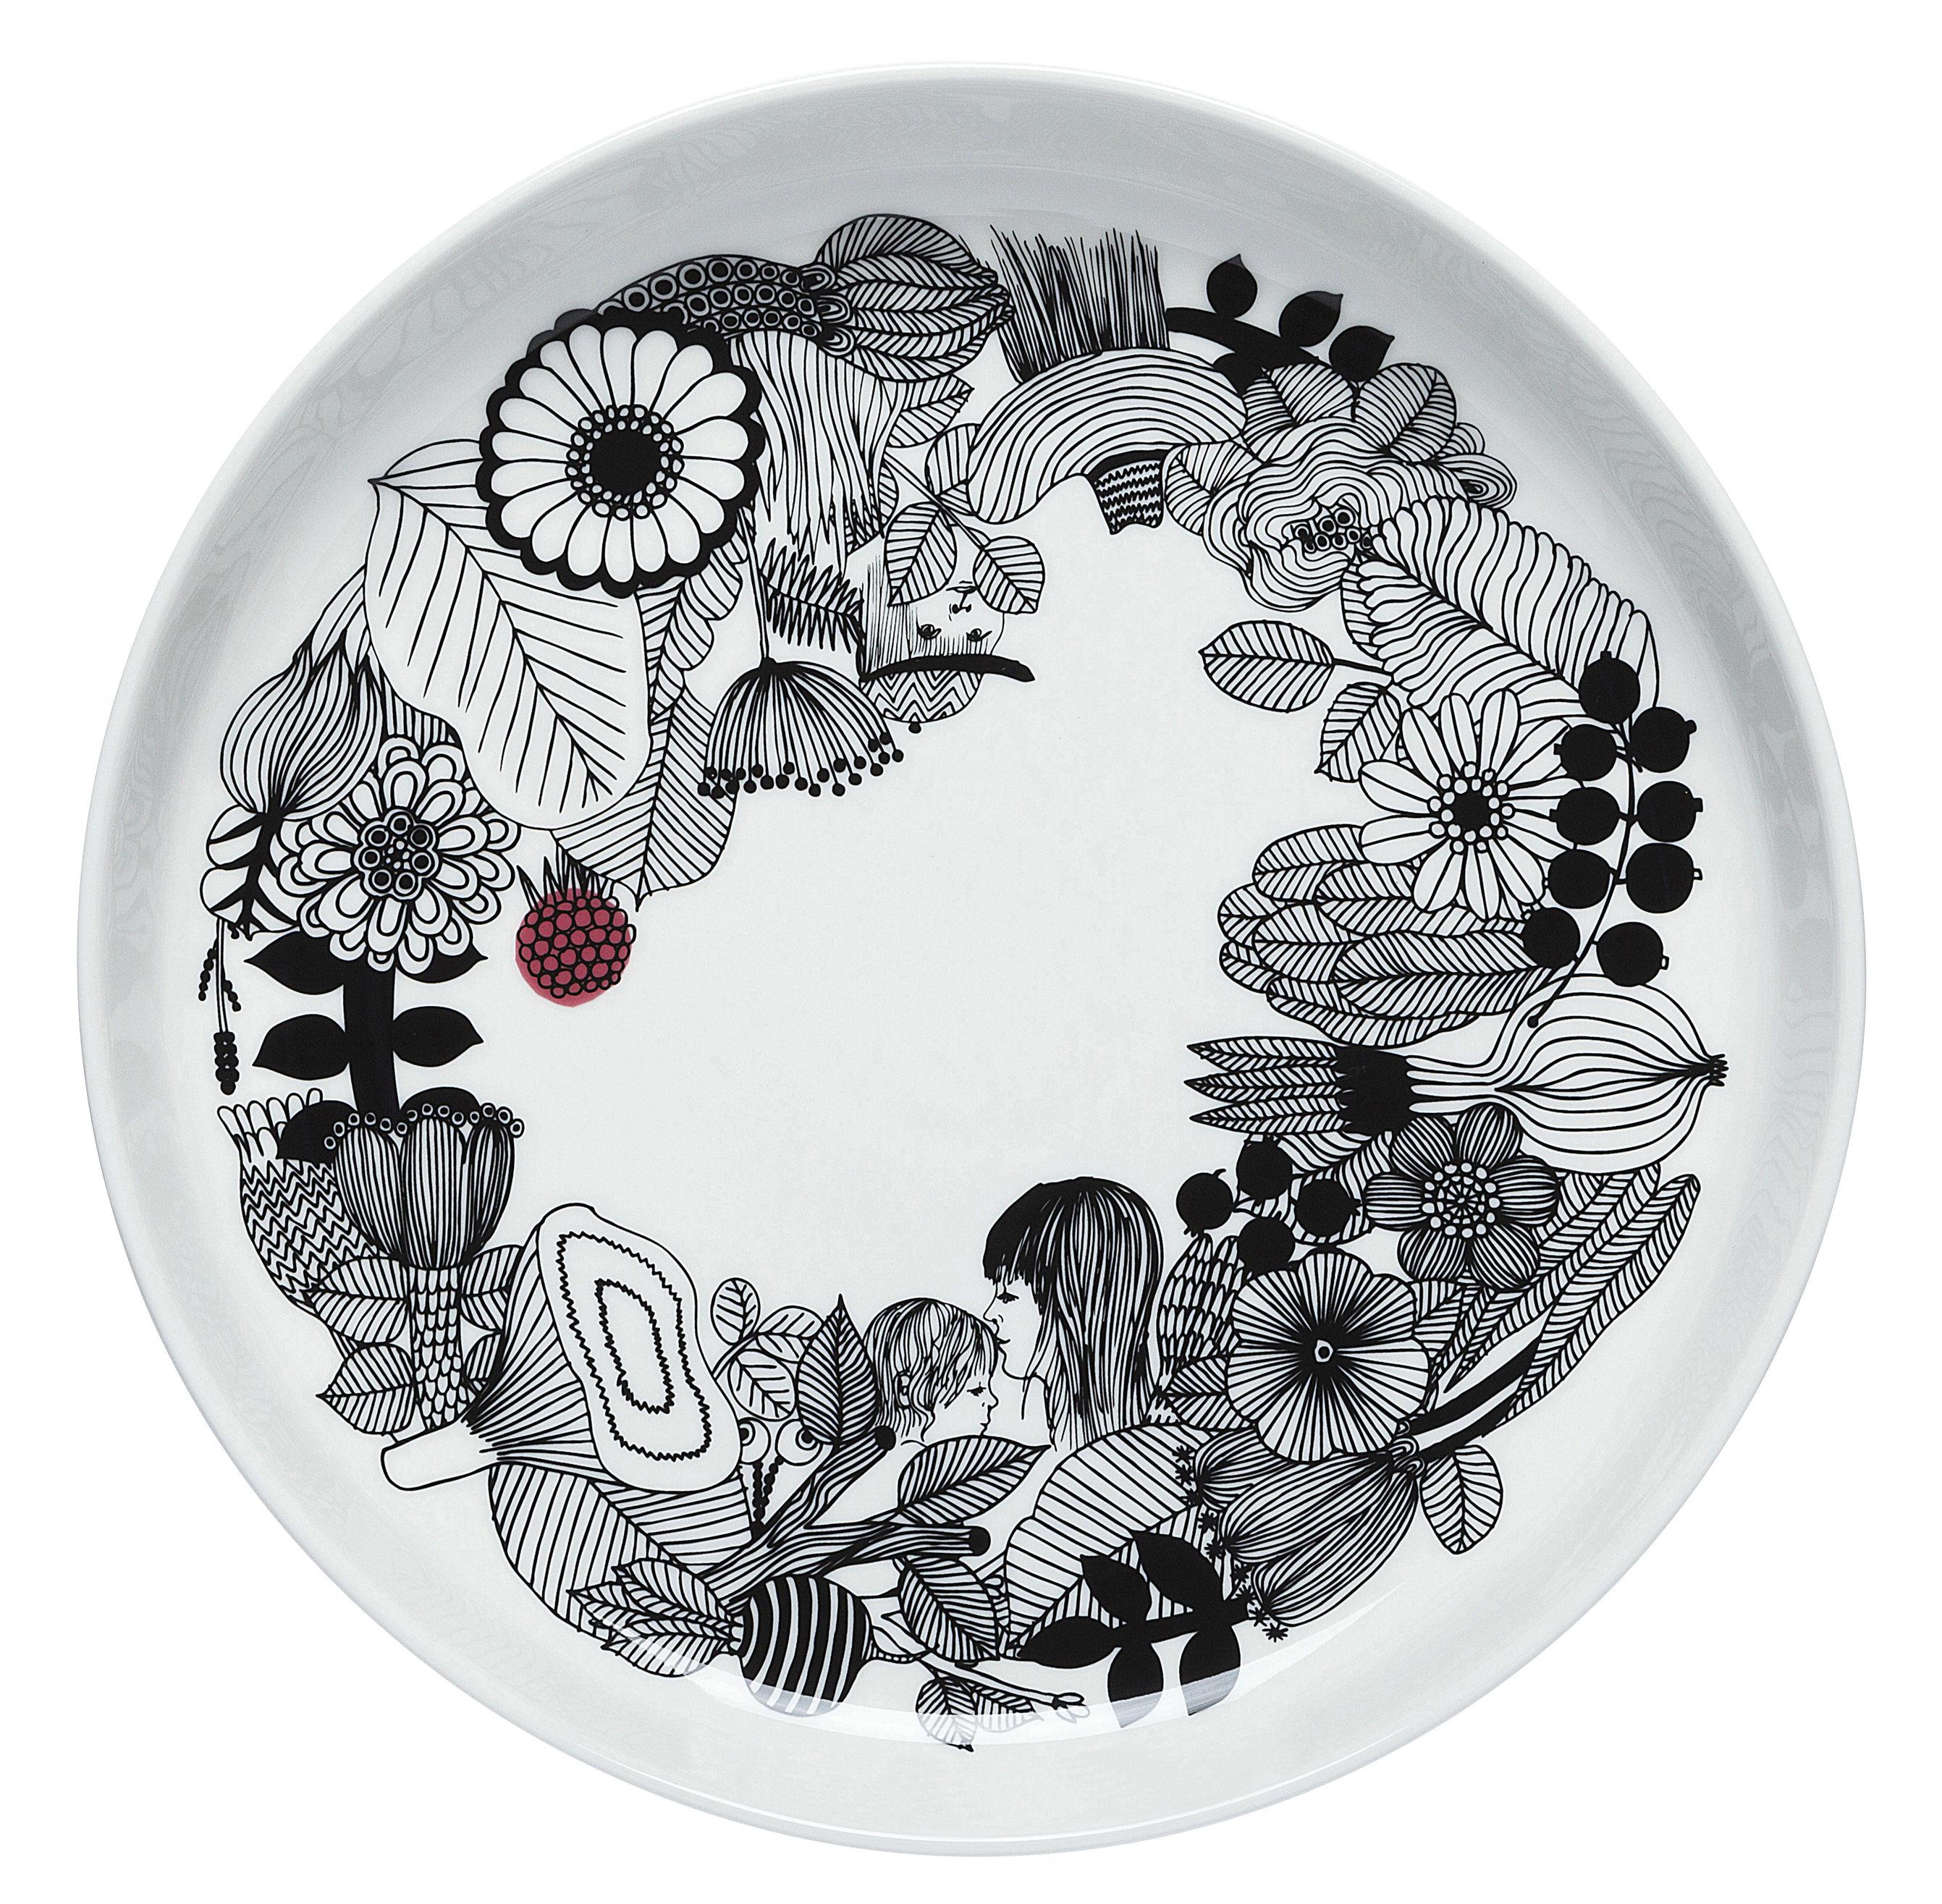 Arts de la table - Plats - Plat de présentation Siirtolapuutarha /Ø 32 cm - Marimekko - Siirtolapuutarha / Blanc, noir & rouge - Porcelaine émaillée